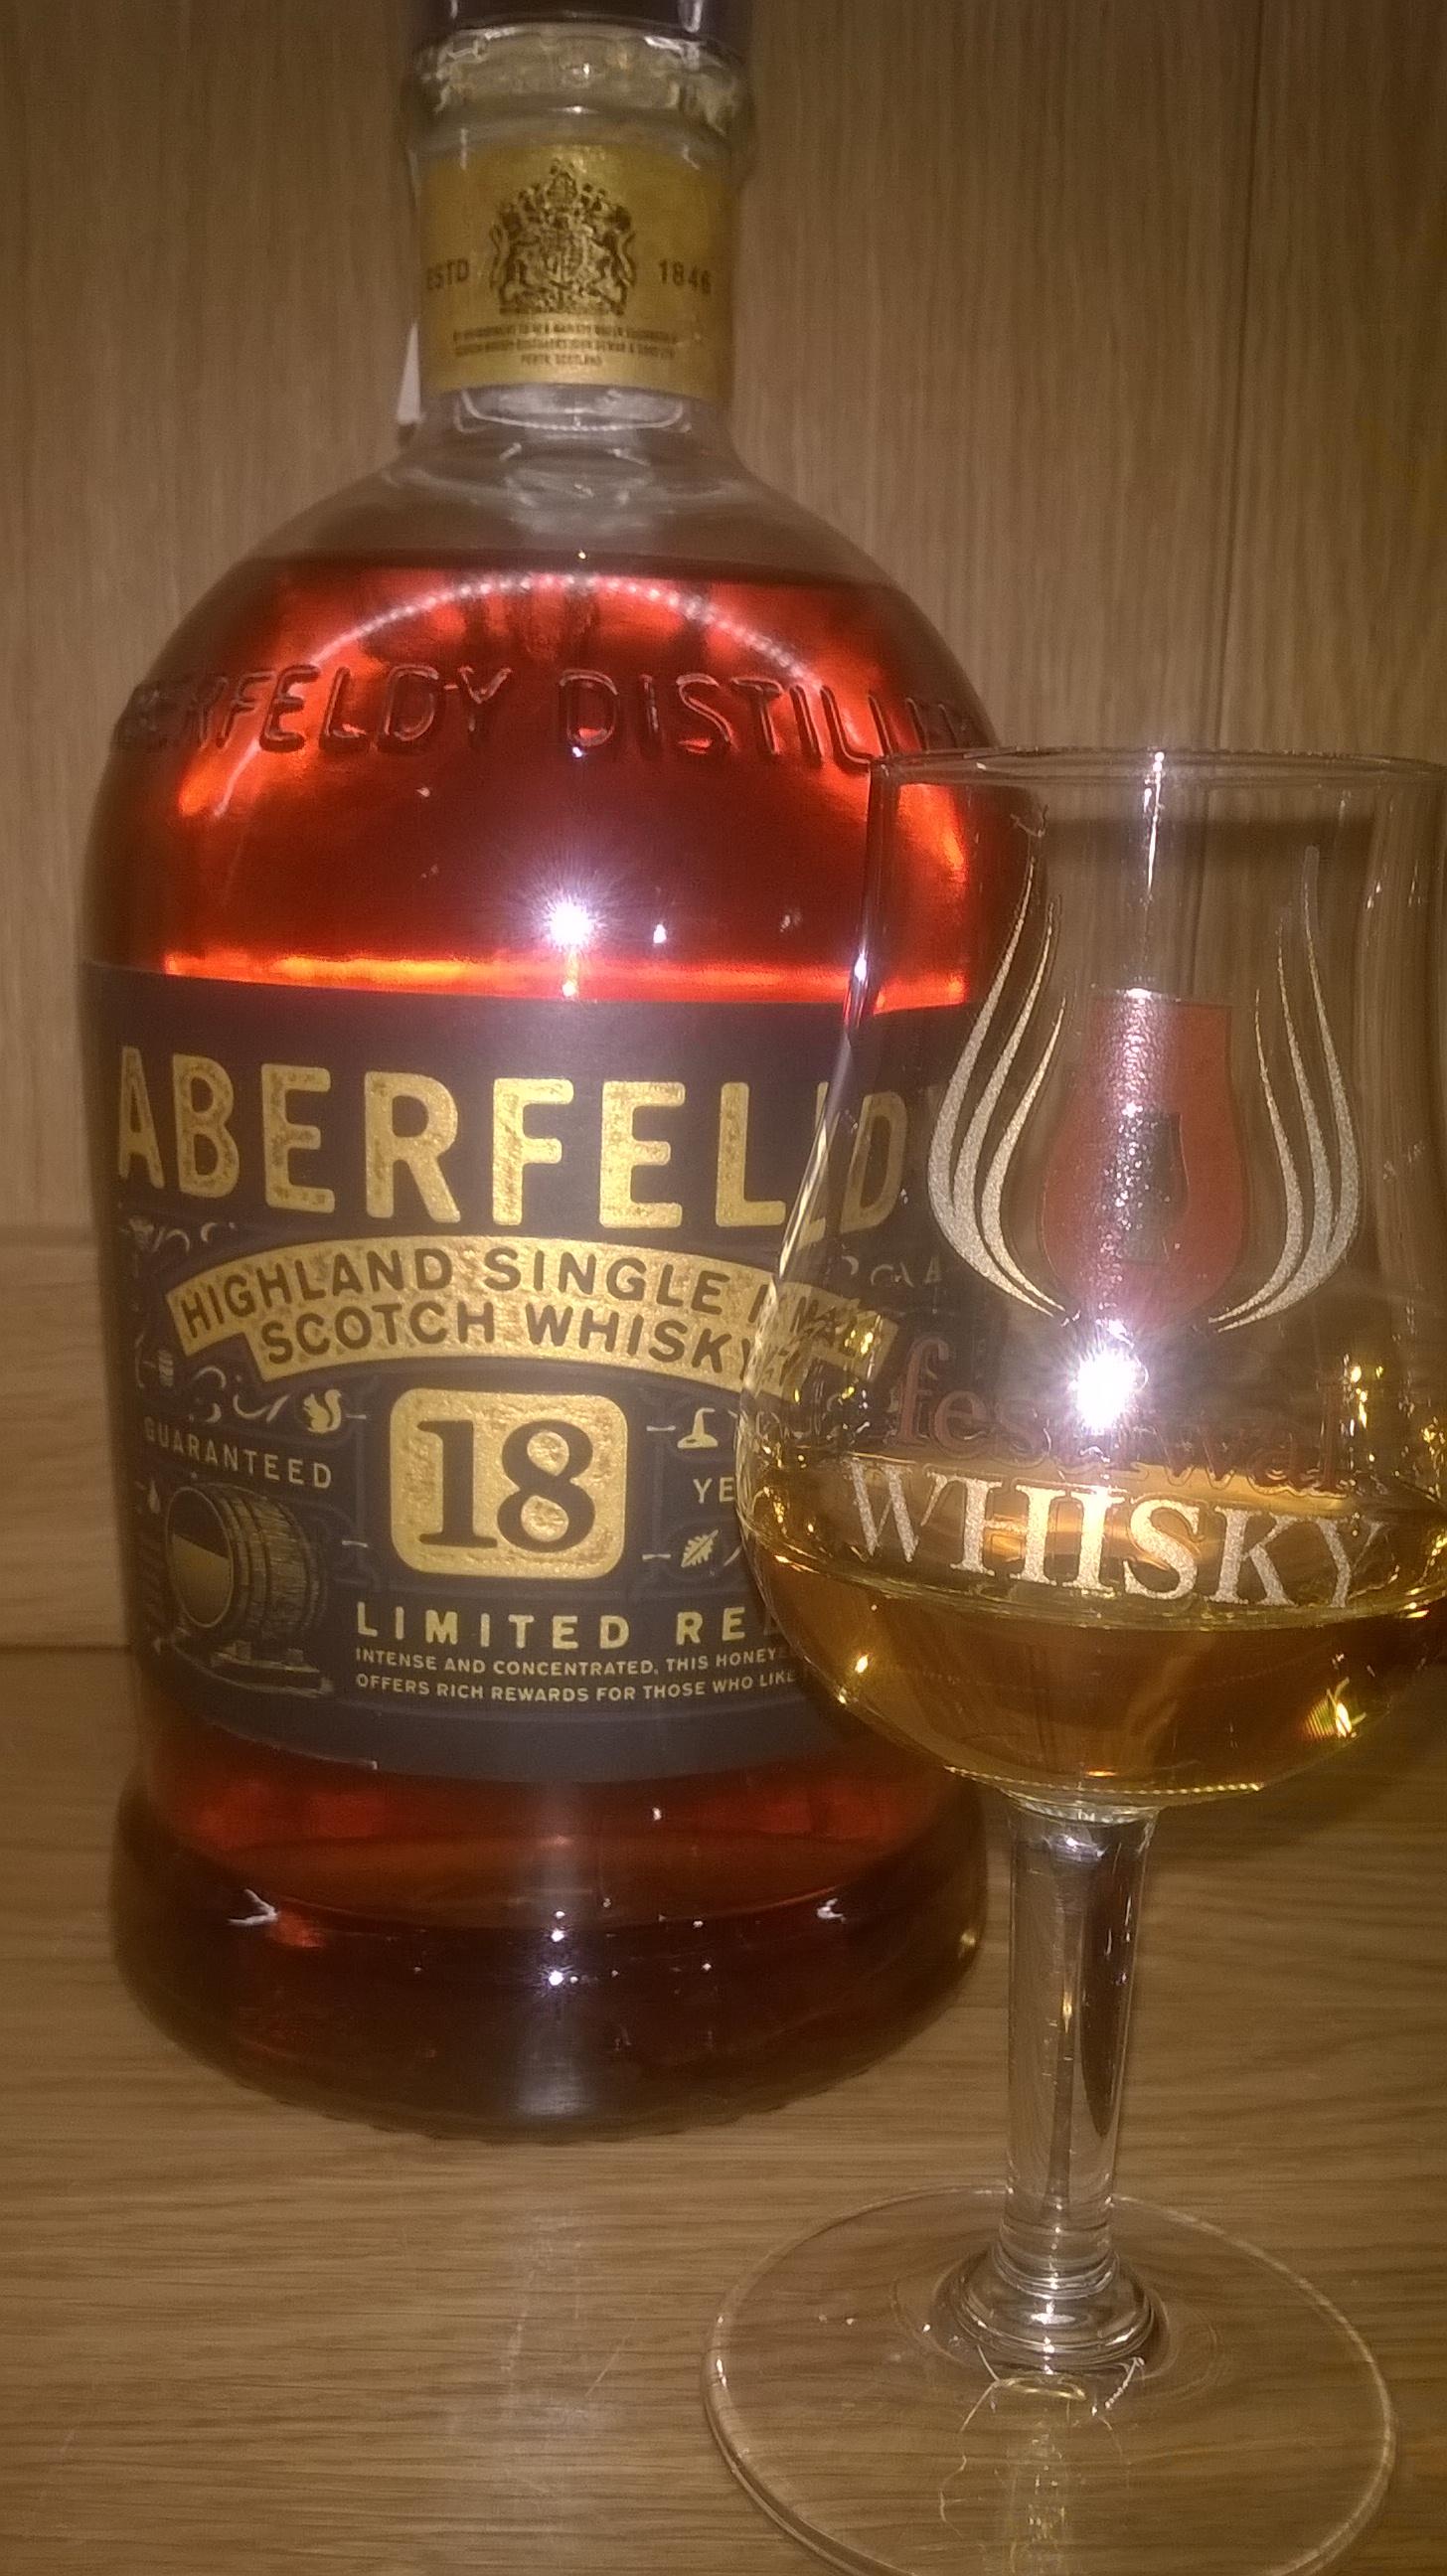 Aberfeldy 18 Year Old